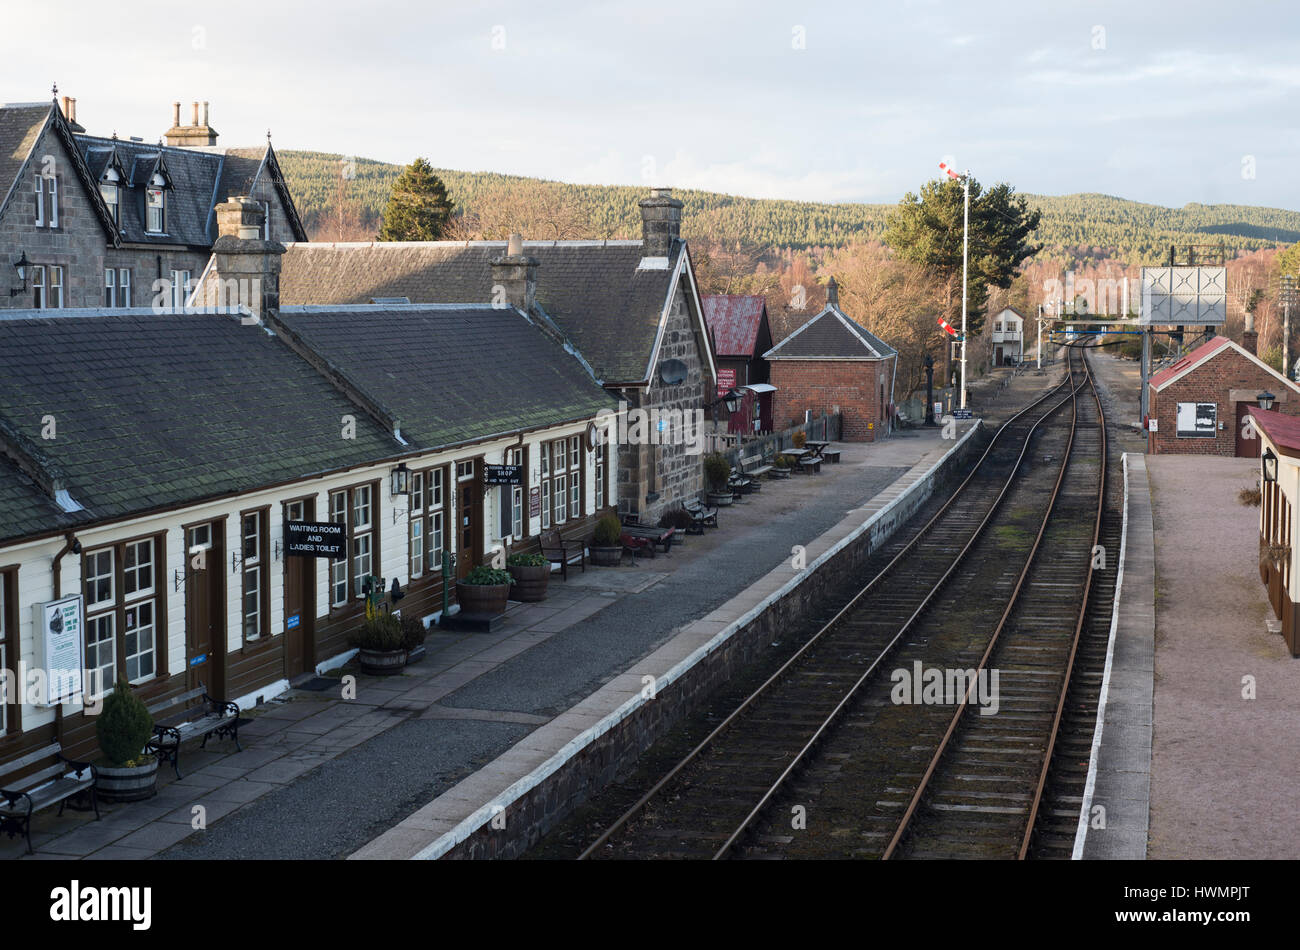 Boat of Garten Train Station - Stock Image